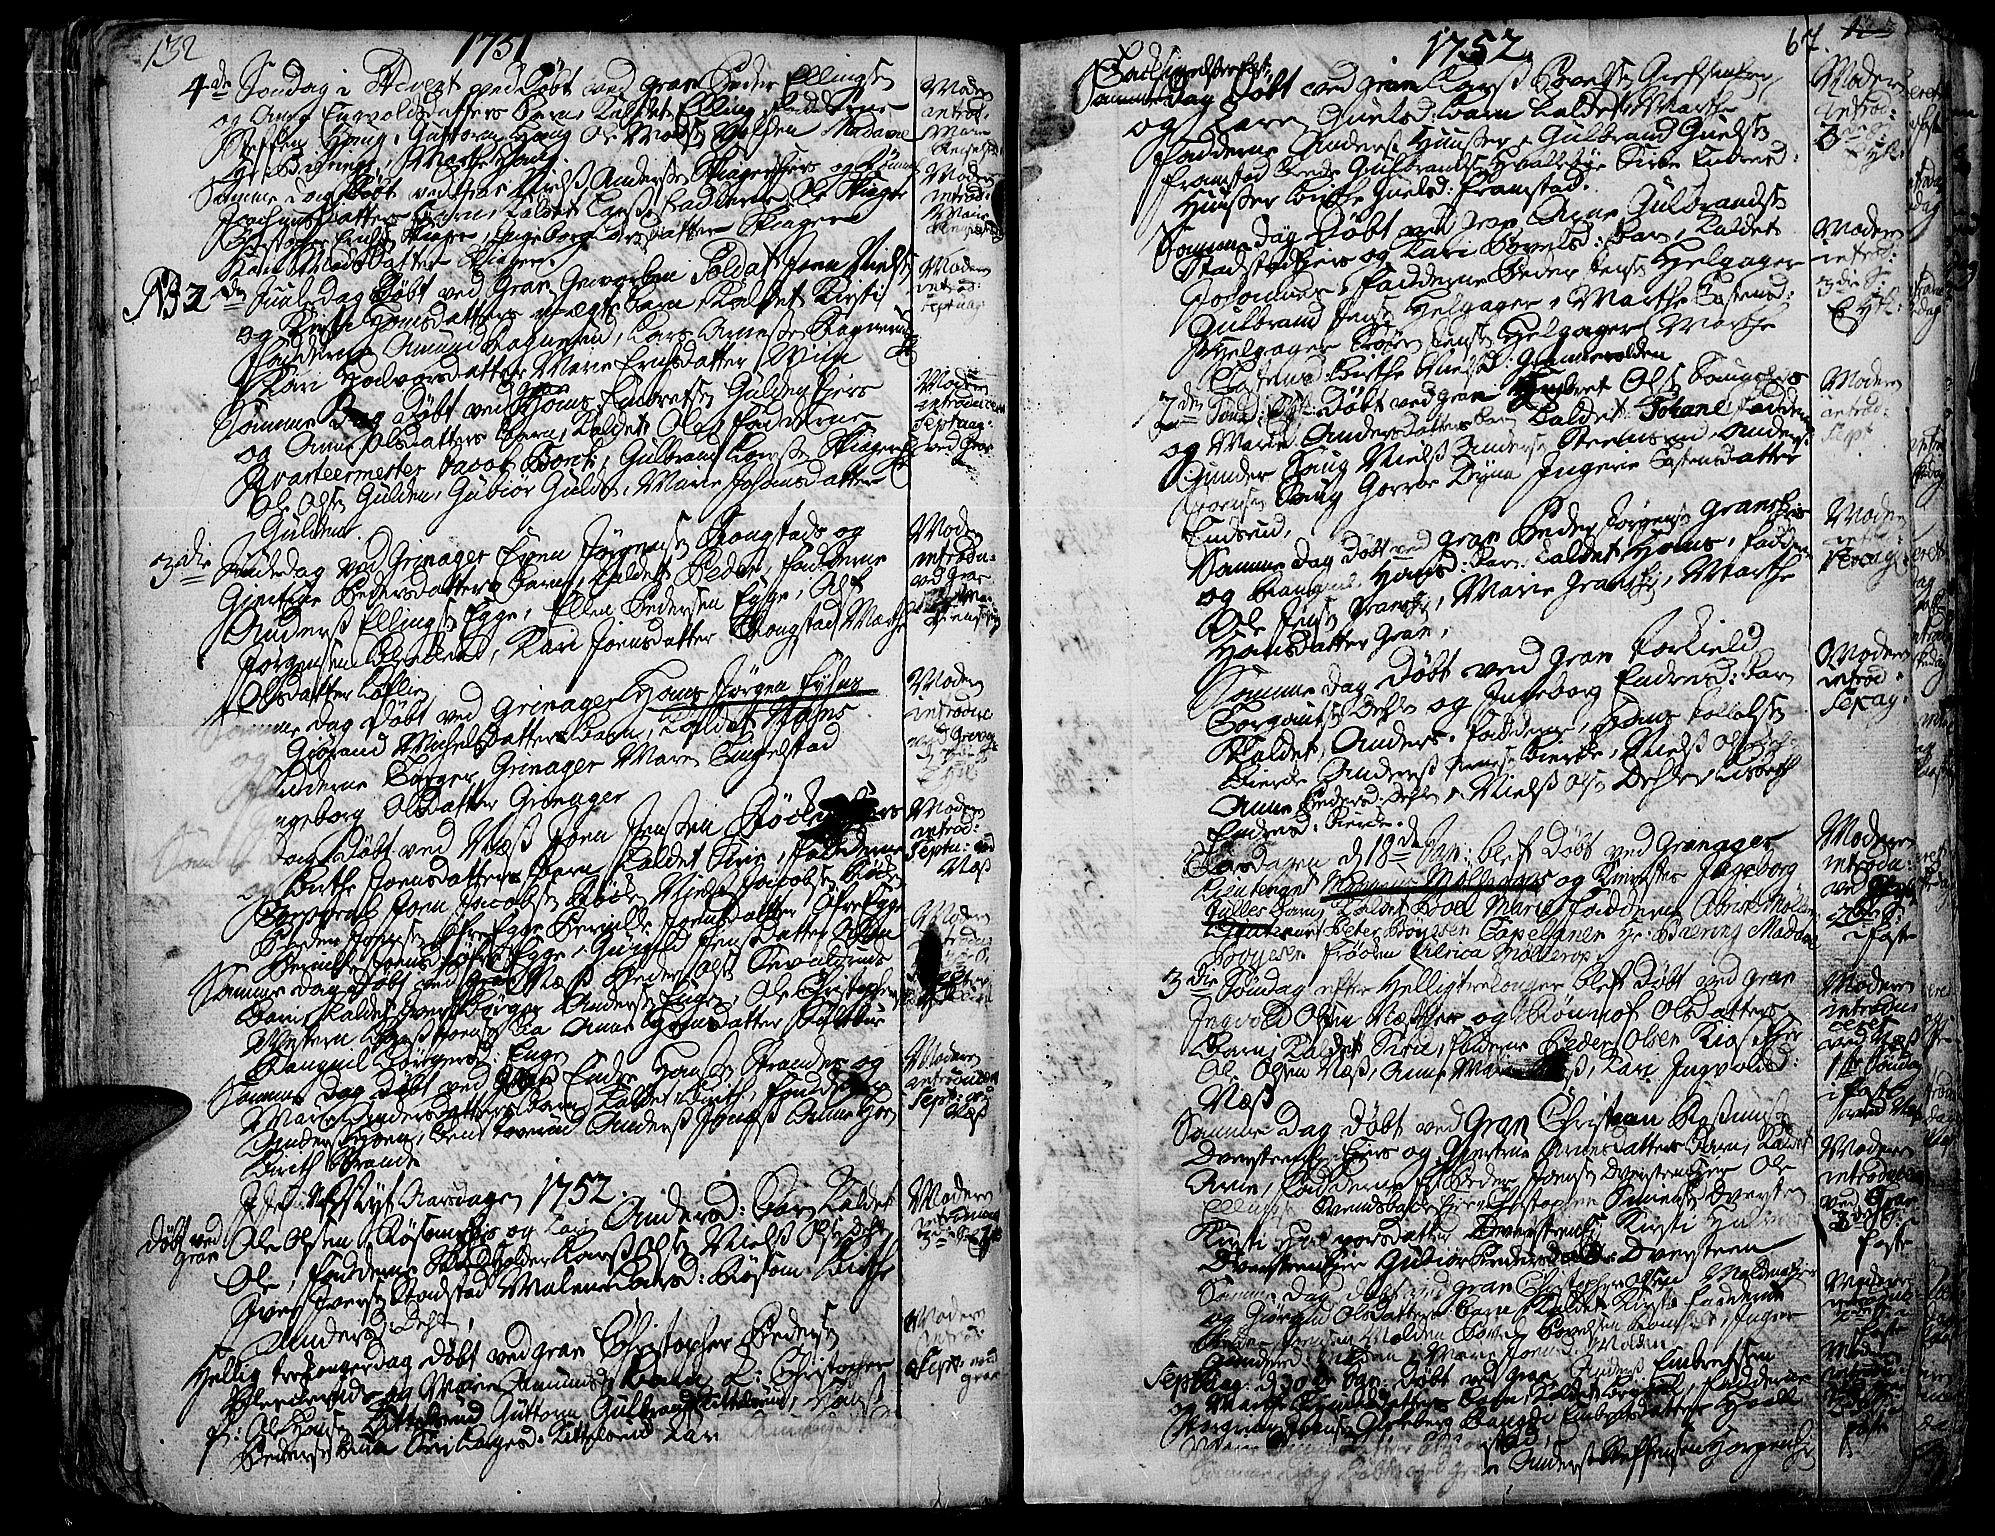 SAH, Gran prestekontor, Ministerialbok nr. 3, 1745-1758, s. 67